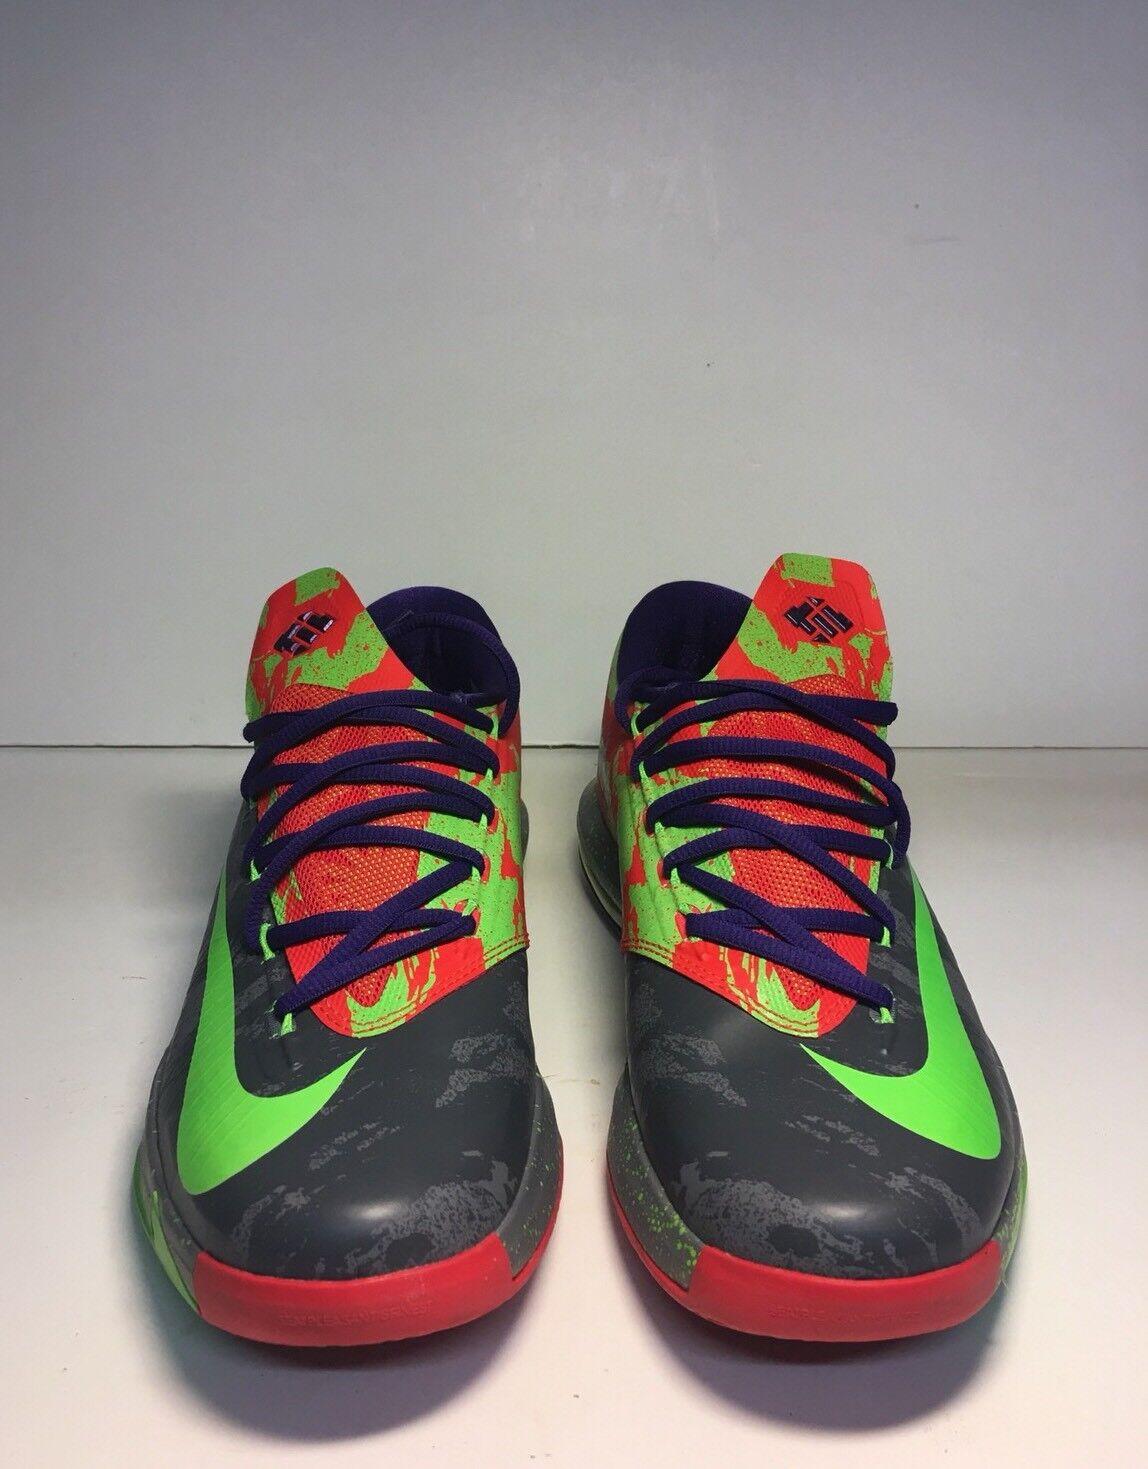 Nike kd 6 kühle graue graue graue electric green - männer - größe 9 basketball - schuhe b971a5